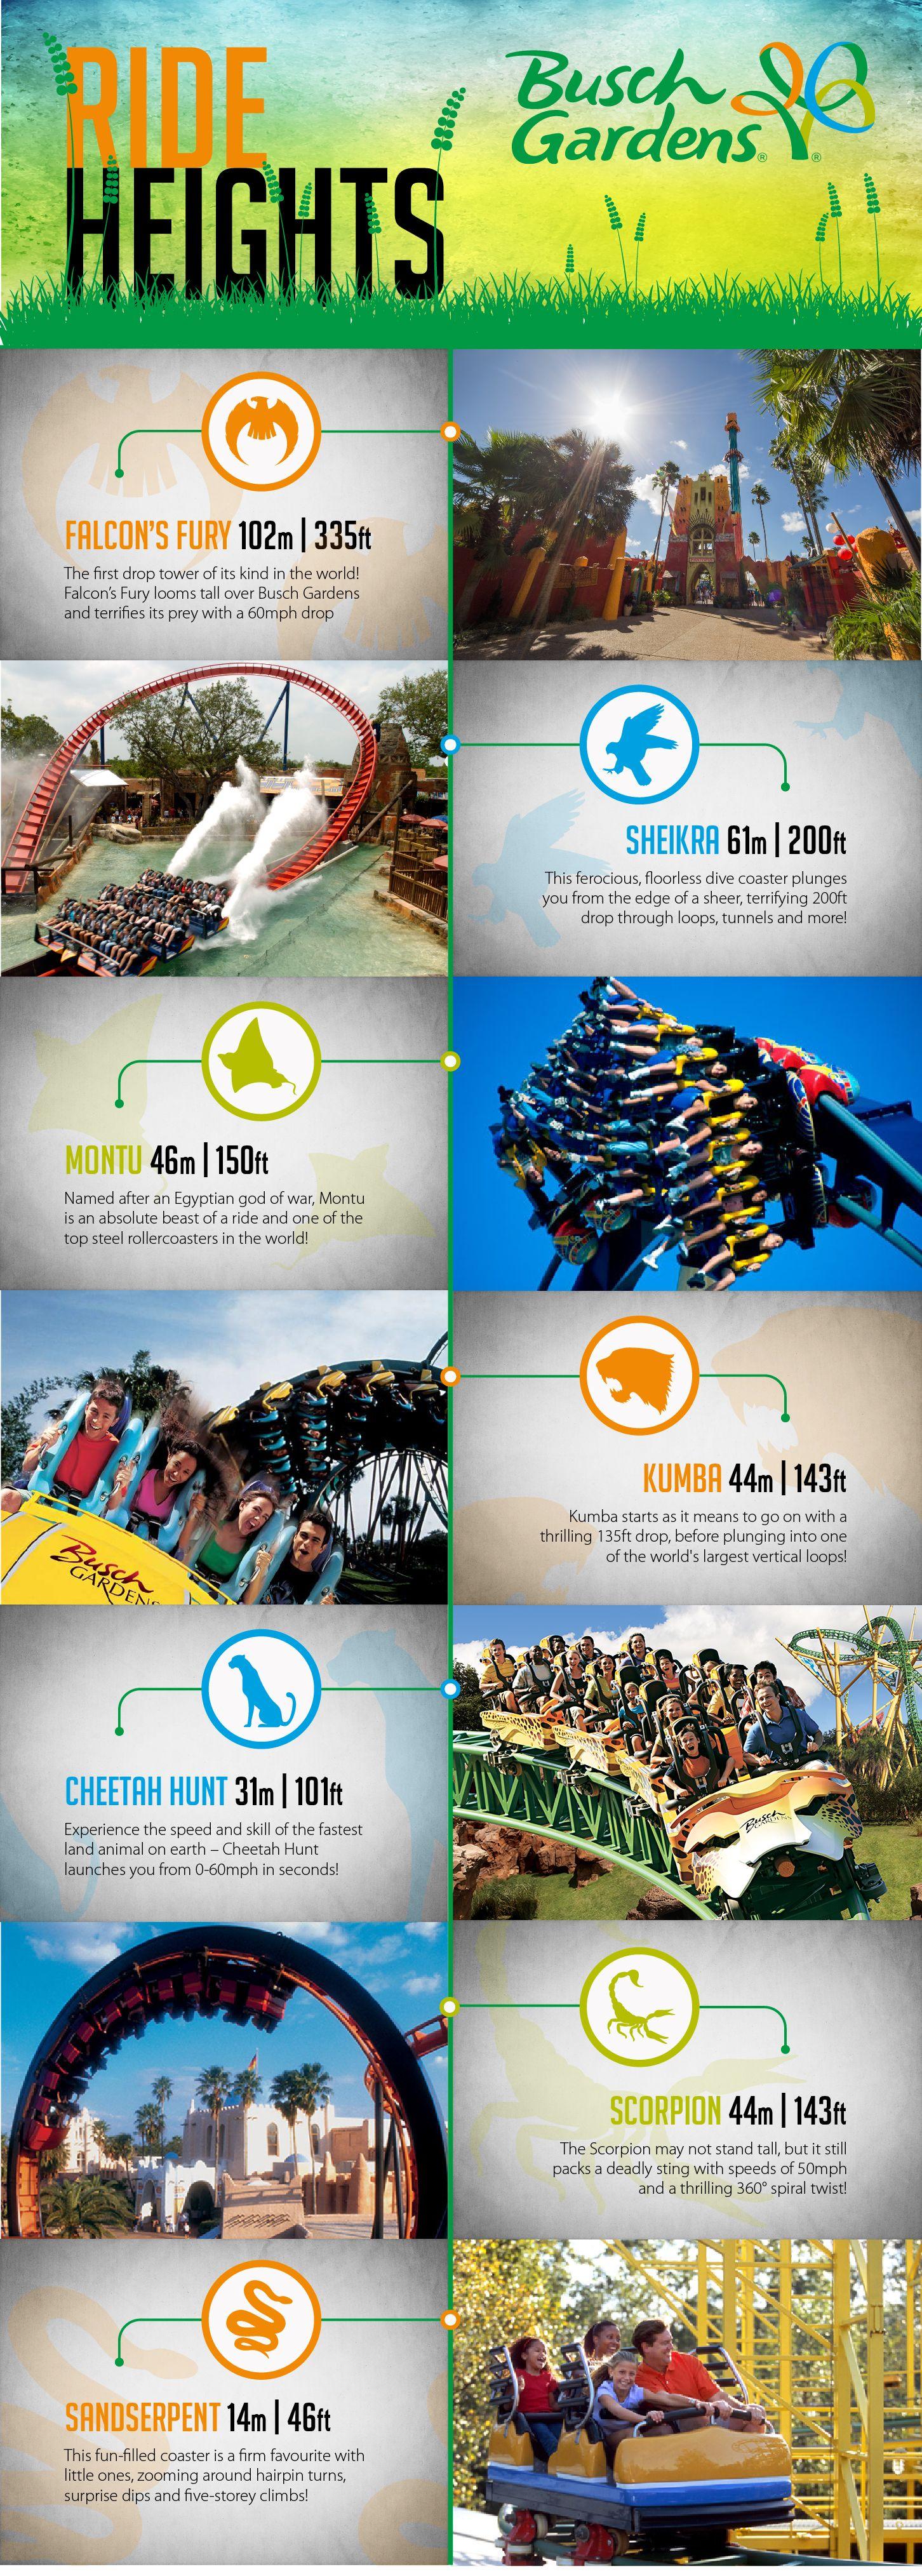 e233adb32a9914120e204d305dc98526 - Ride Height Requirements Busch Gardens Tampa